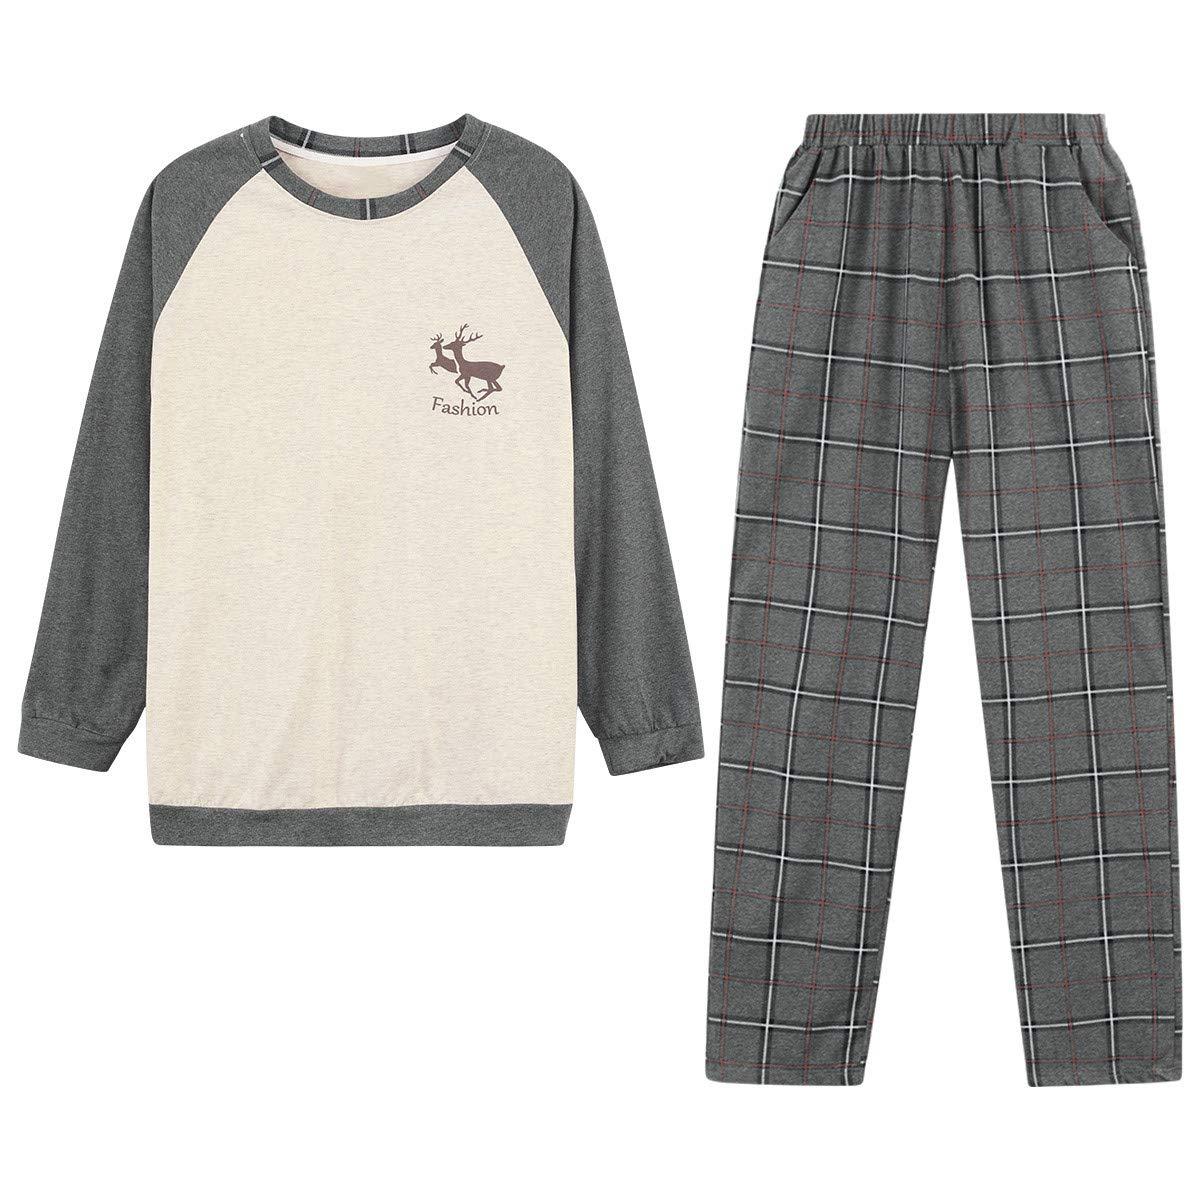 Buy Top-Vigor 2pcs Big Boys Pajama Sets Cotton Flannel Teen Boy Winter Pajama  Pjs Long Sleeve Sleepwear for Young Youth Boys at Amazon.in